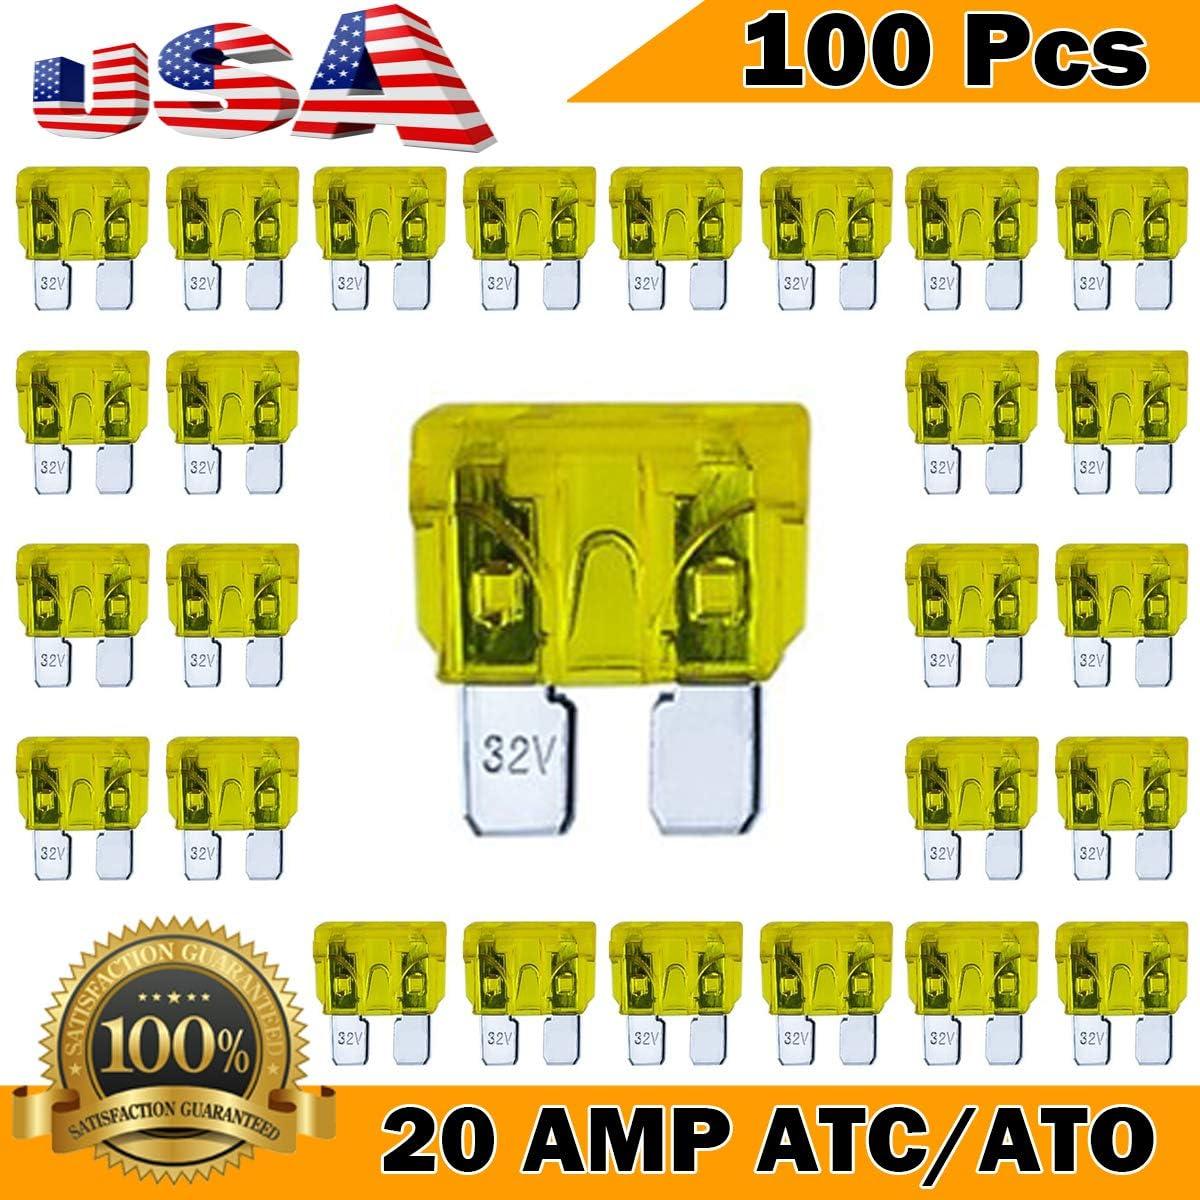 10 Pack 7.5 AMP ATC//ATO STANDARD Regular FUSE BLADE 7.5A CAR TRUCK BOAT MARINE